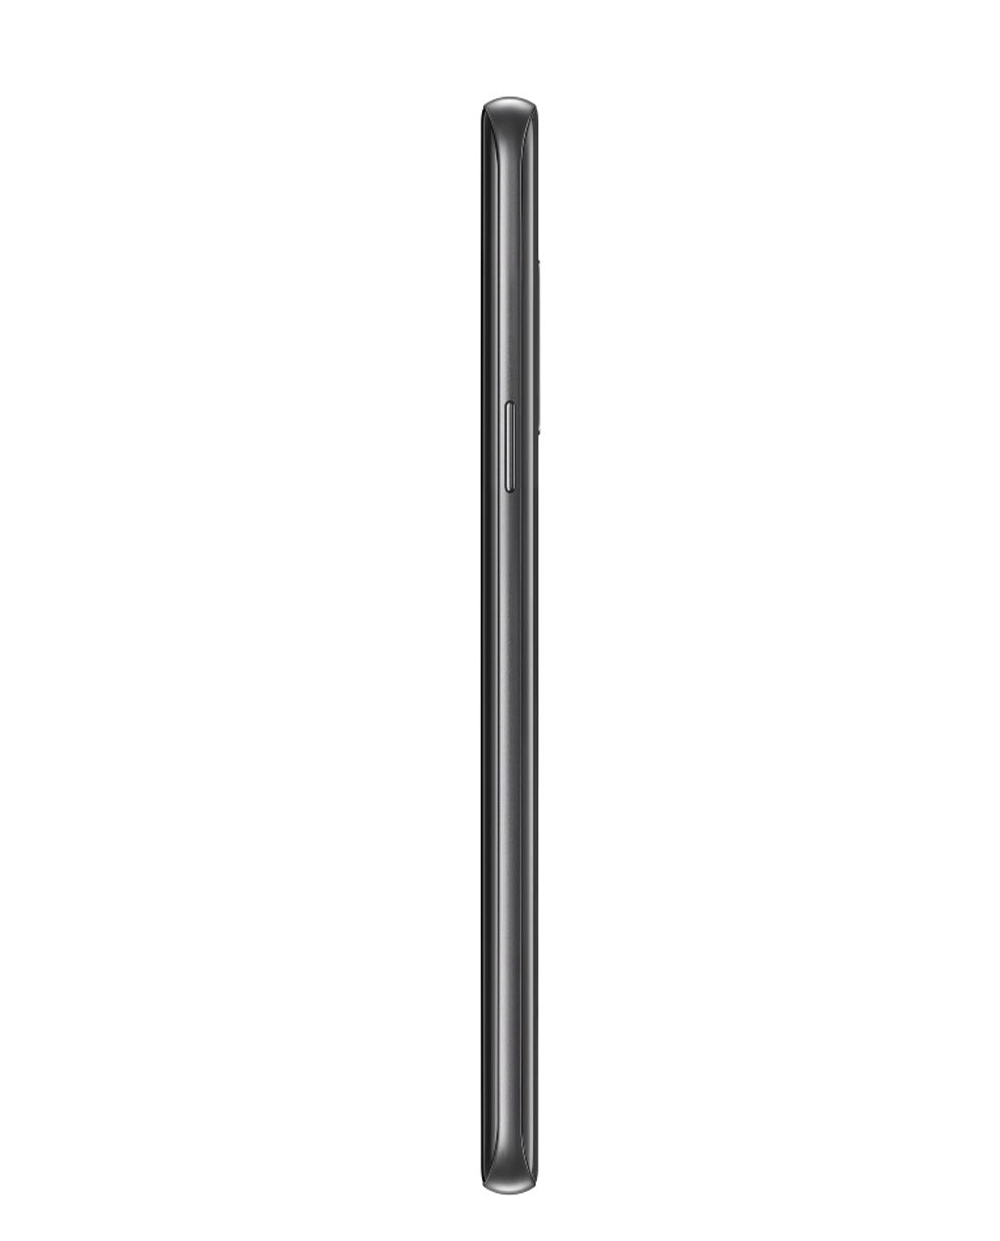 Samsung Galaxy S9 DUAL  (SM-G960) 357988091190202 - 3